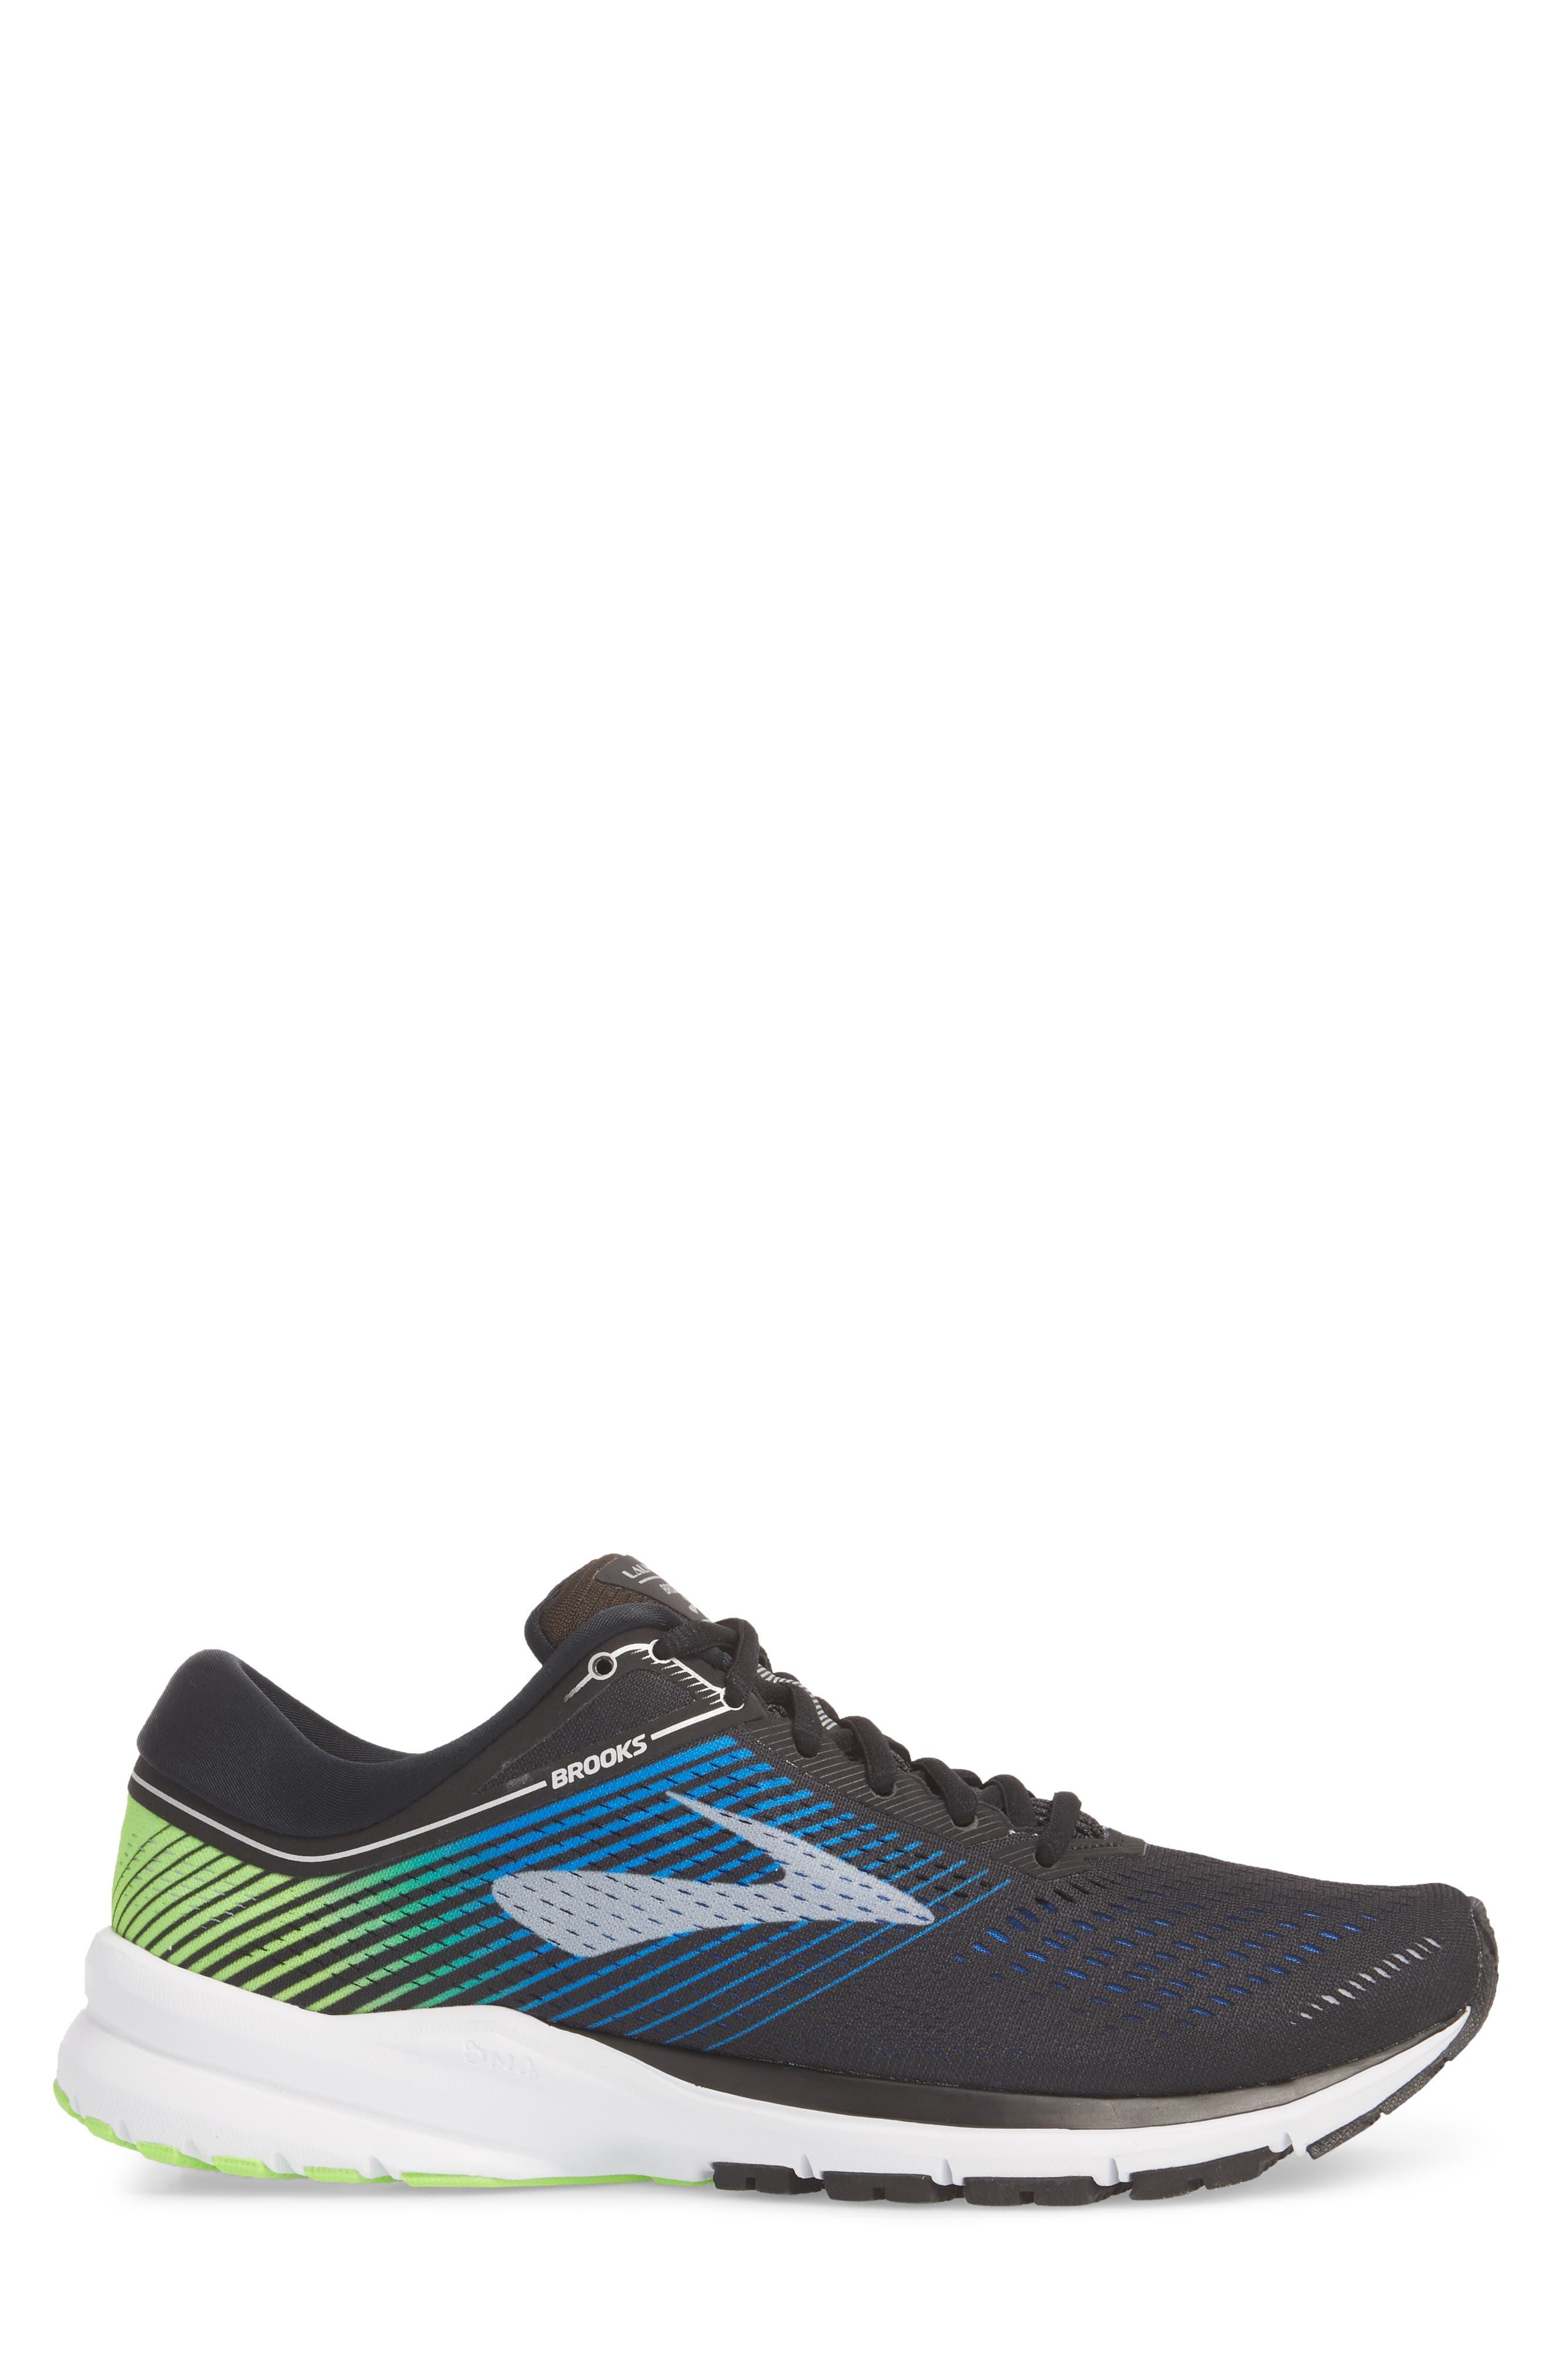 Launch 5 Running Shoe,                             Alternate thumbnail 3, color,                             Black/ Blue/ Green